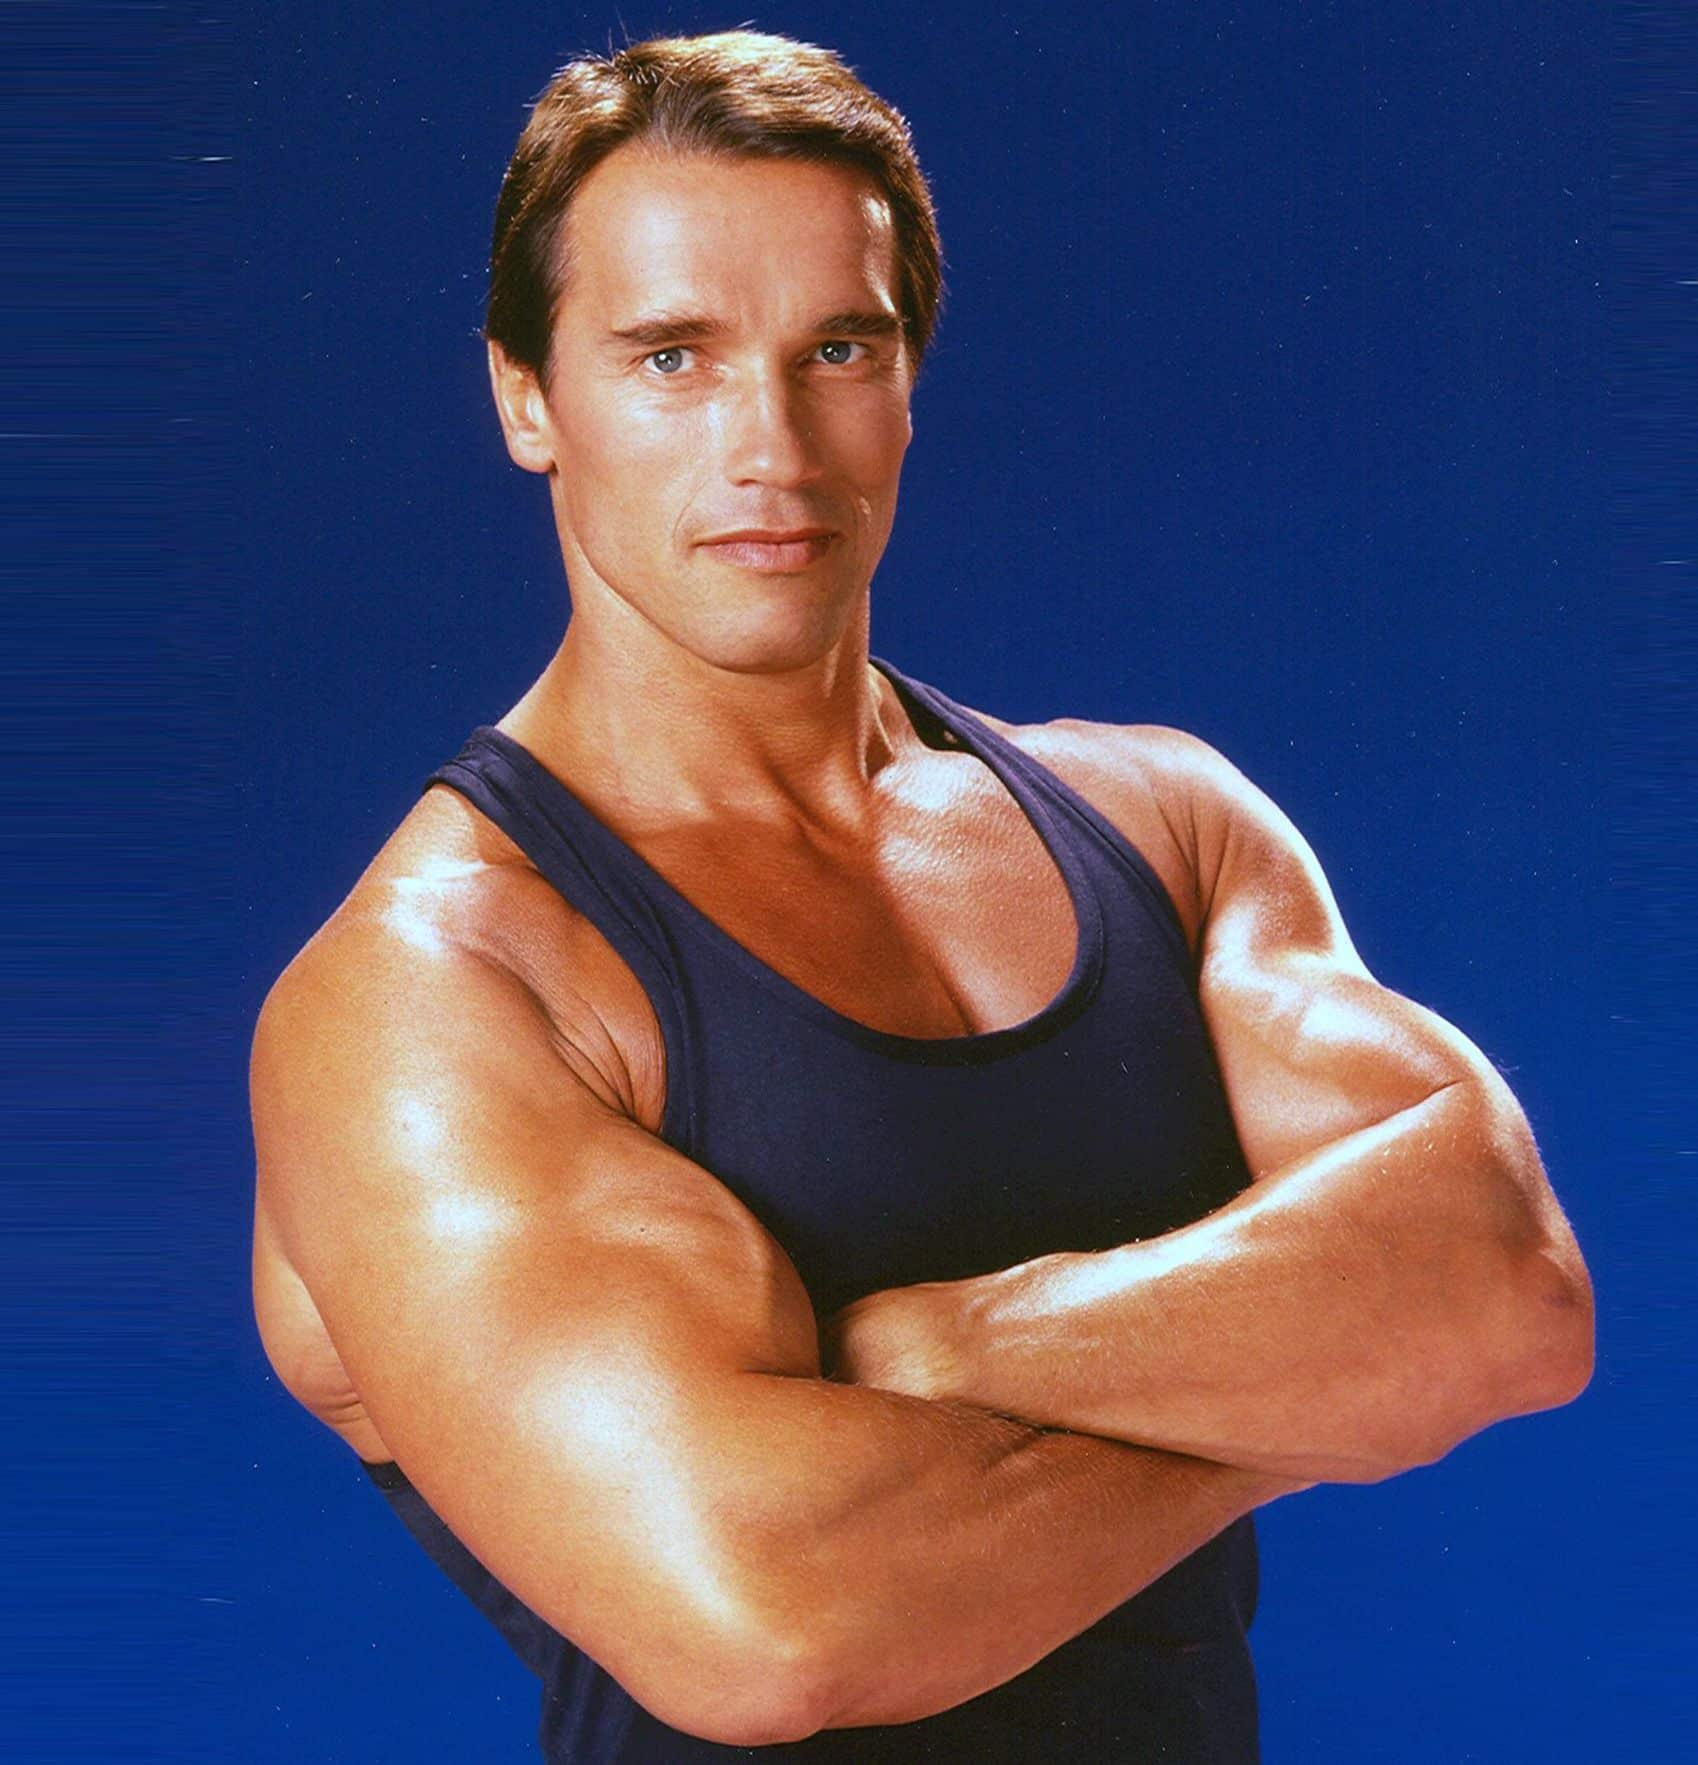 16 3 1 20 Hilariously Wonderful Photos Of 80s Male TV Stars